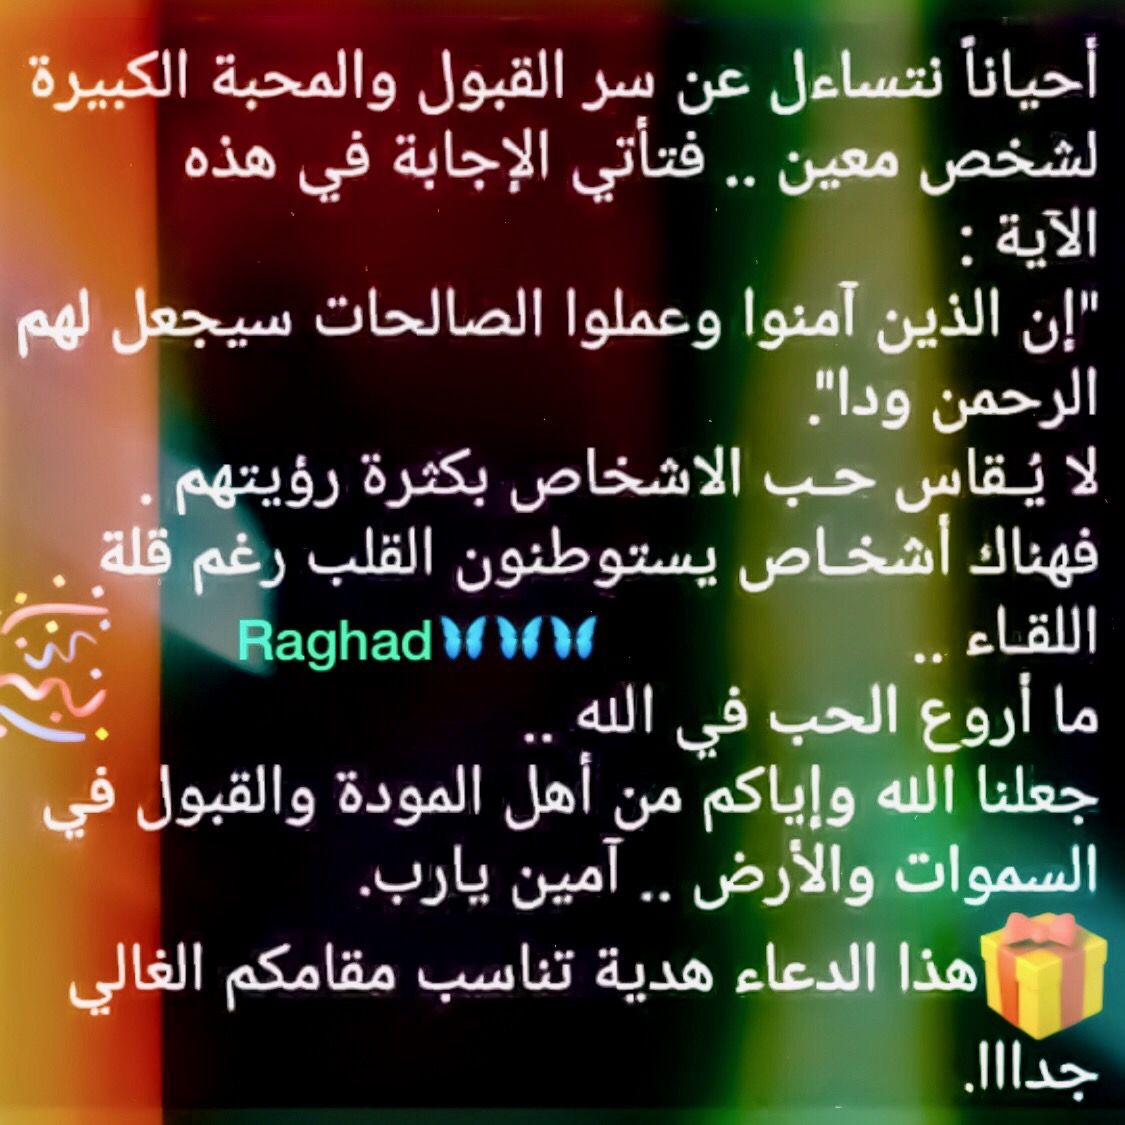 Desertrose هو الله الذي لا إله إلا هو عالم الغيب والشهادة هو الرحمن الرحيم هو الله الذي لا إله إلا هو الملك القدوس السلام المؤمن Neon Signs Islam Deserts